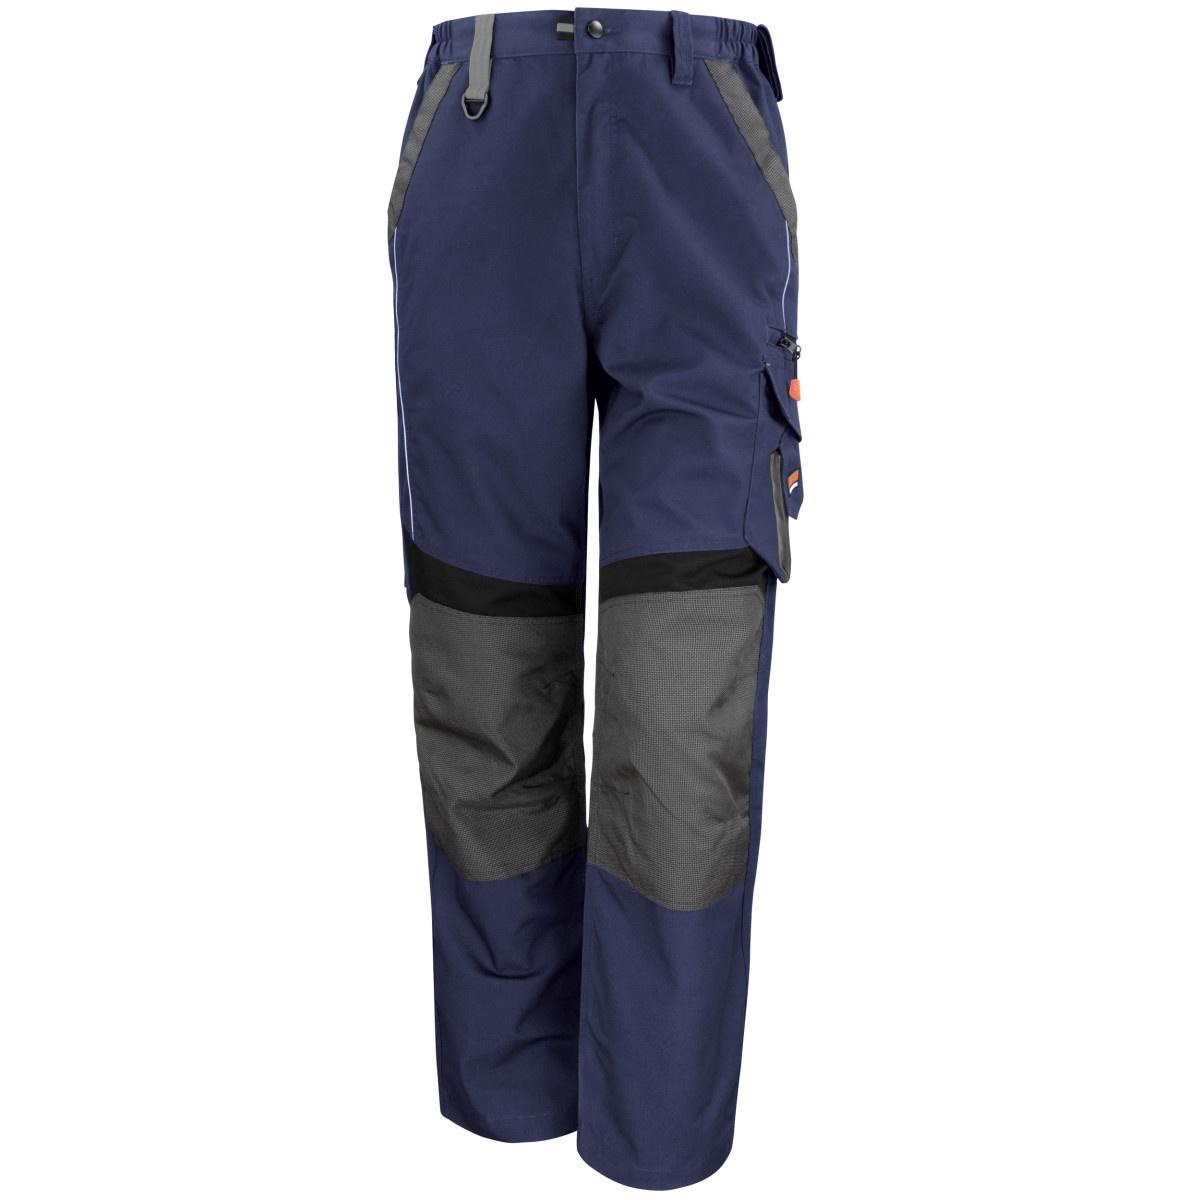 Result Mens Technical Work Trousers (Reg 32 Inch Leg) (36) (Navy/Black)